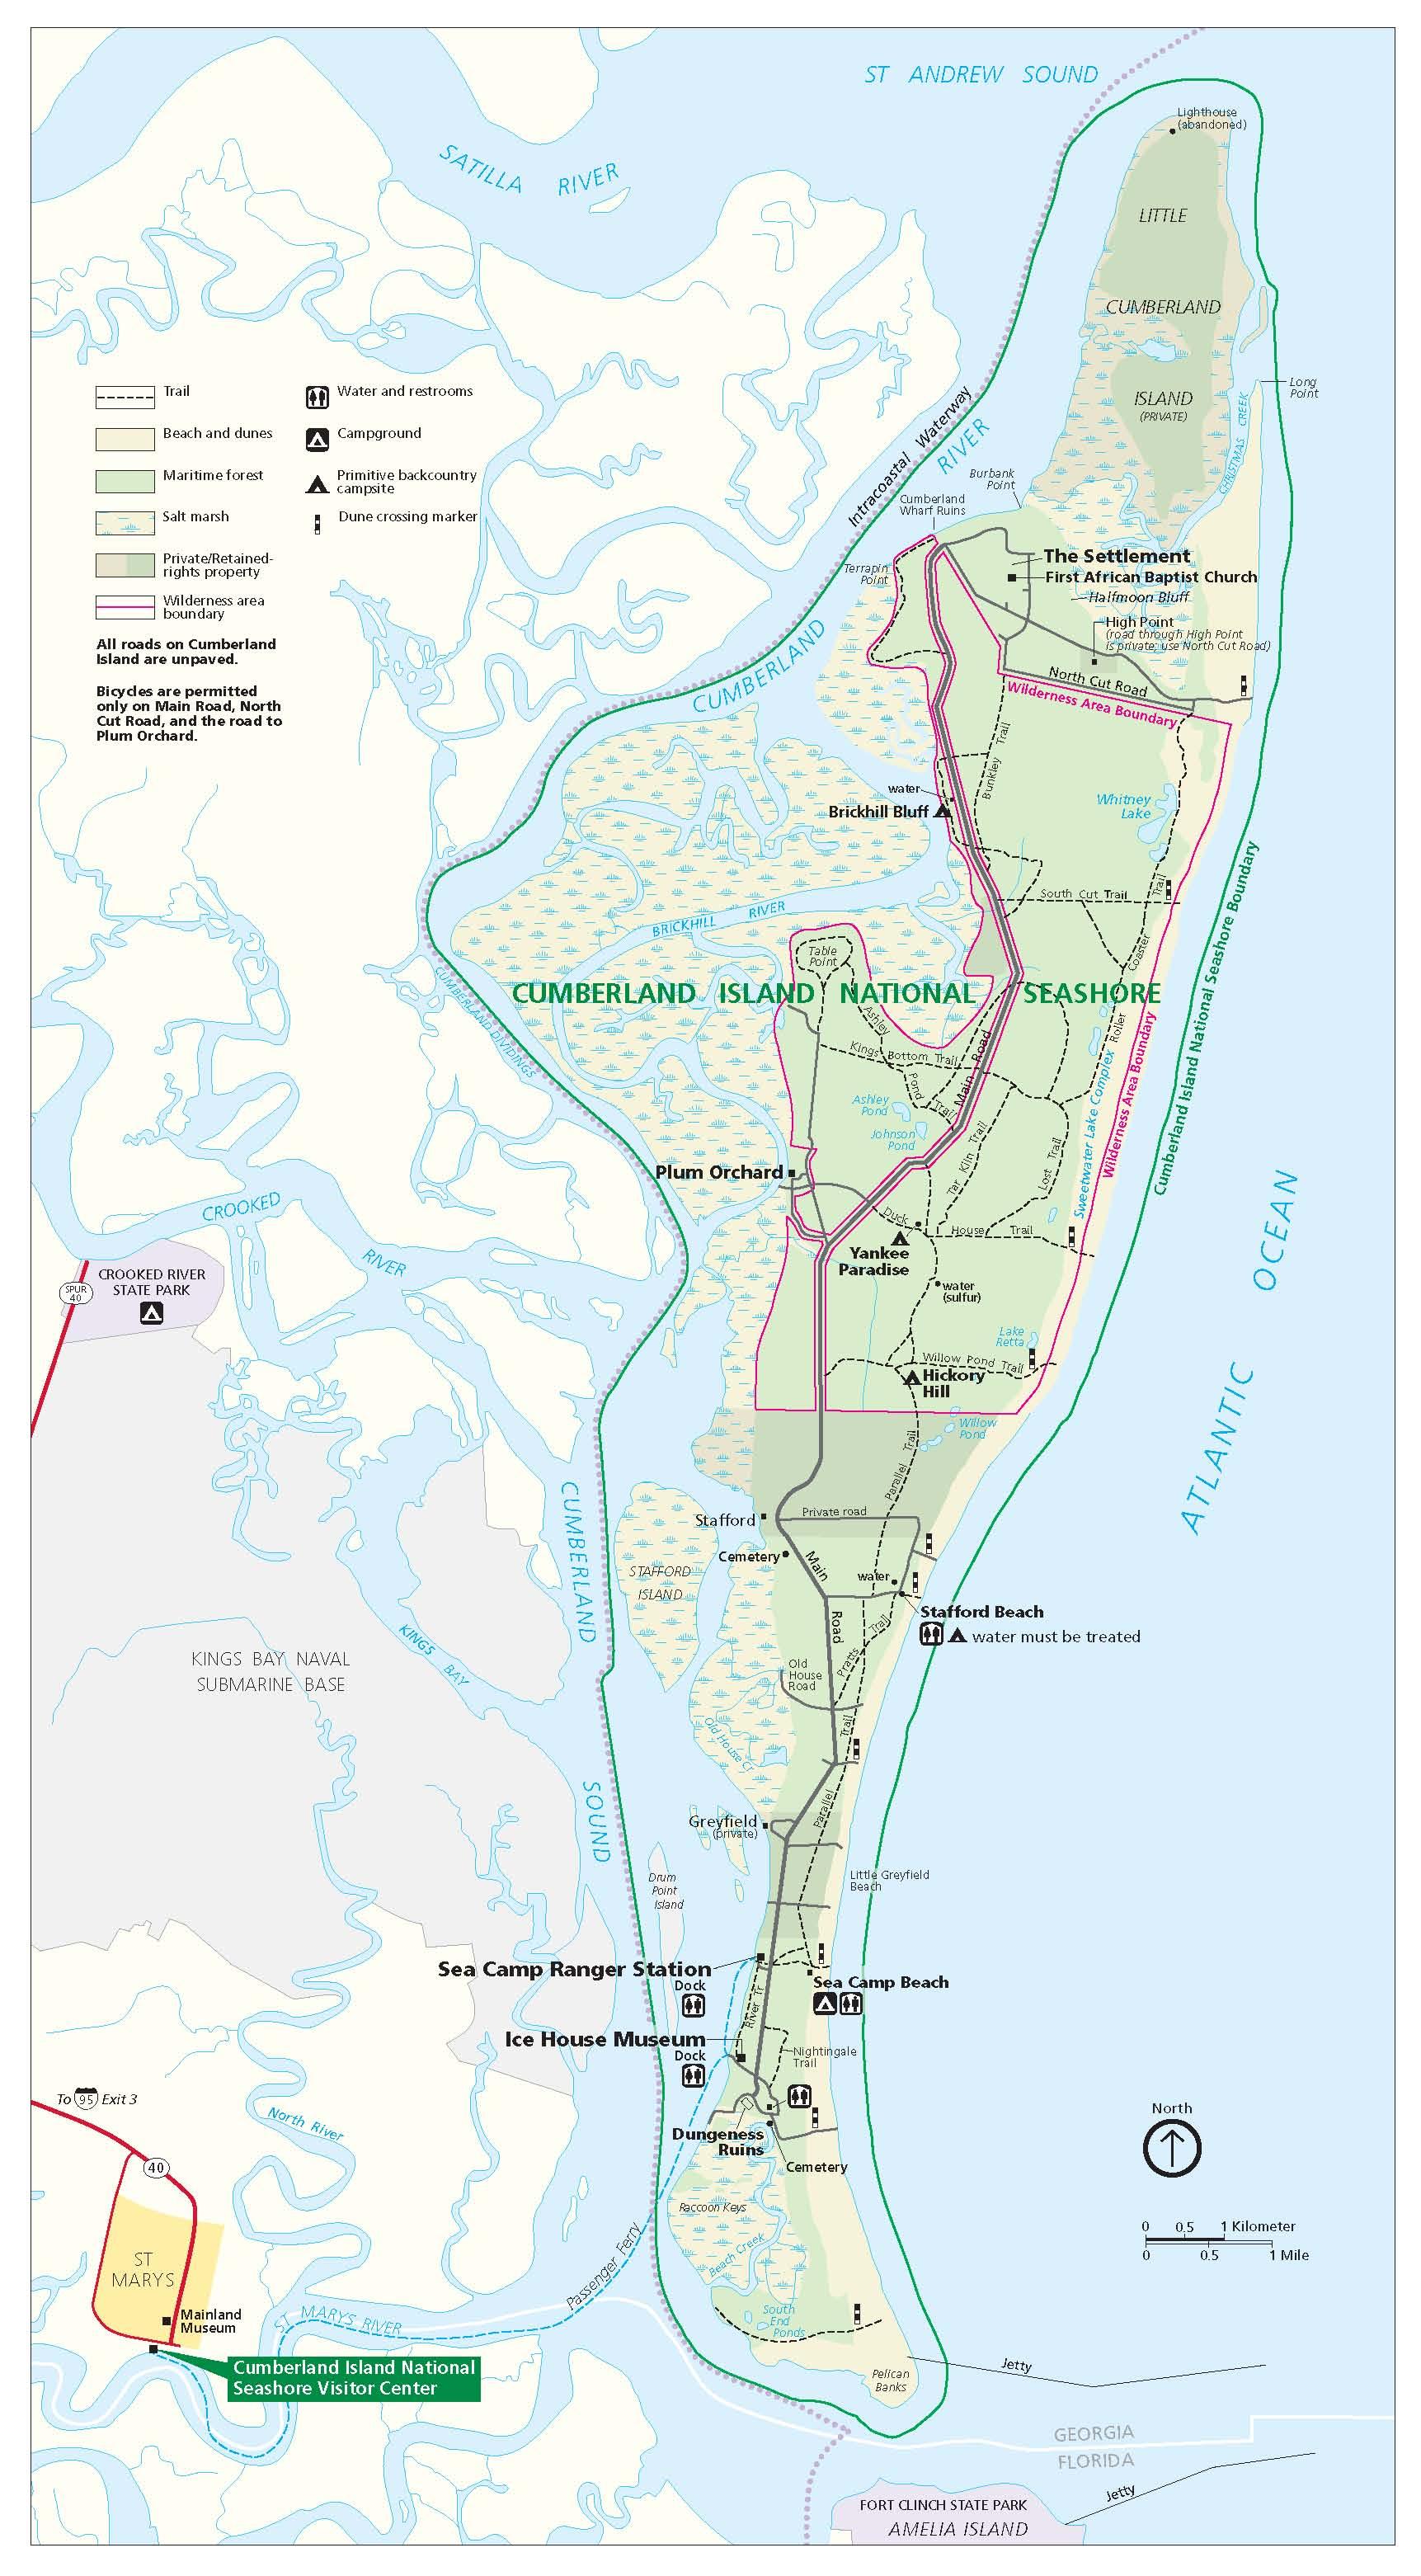 Cumberland Island Map File:Cumberland Island National Seashore map 2007.08.